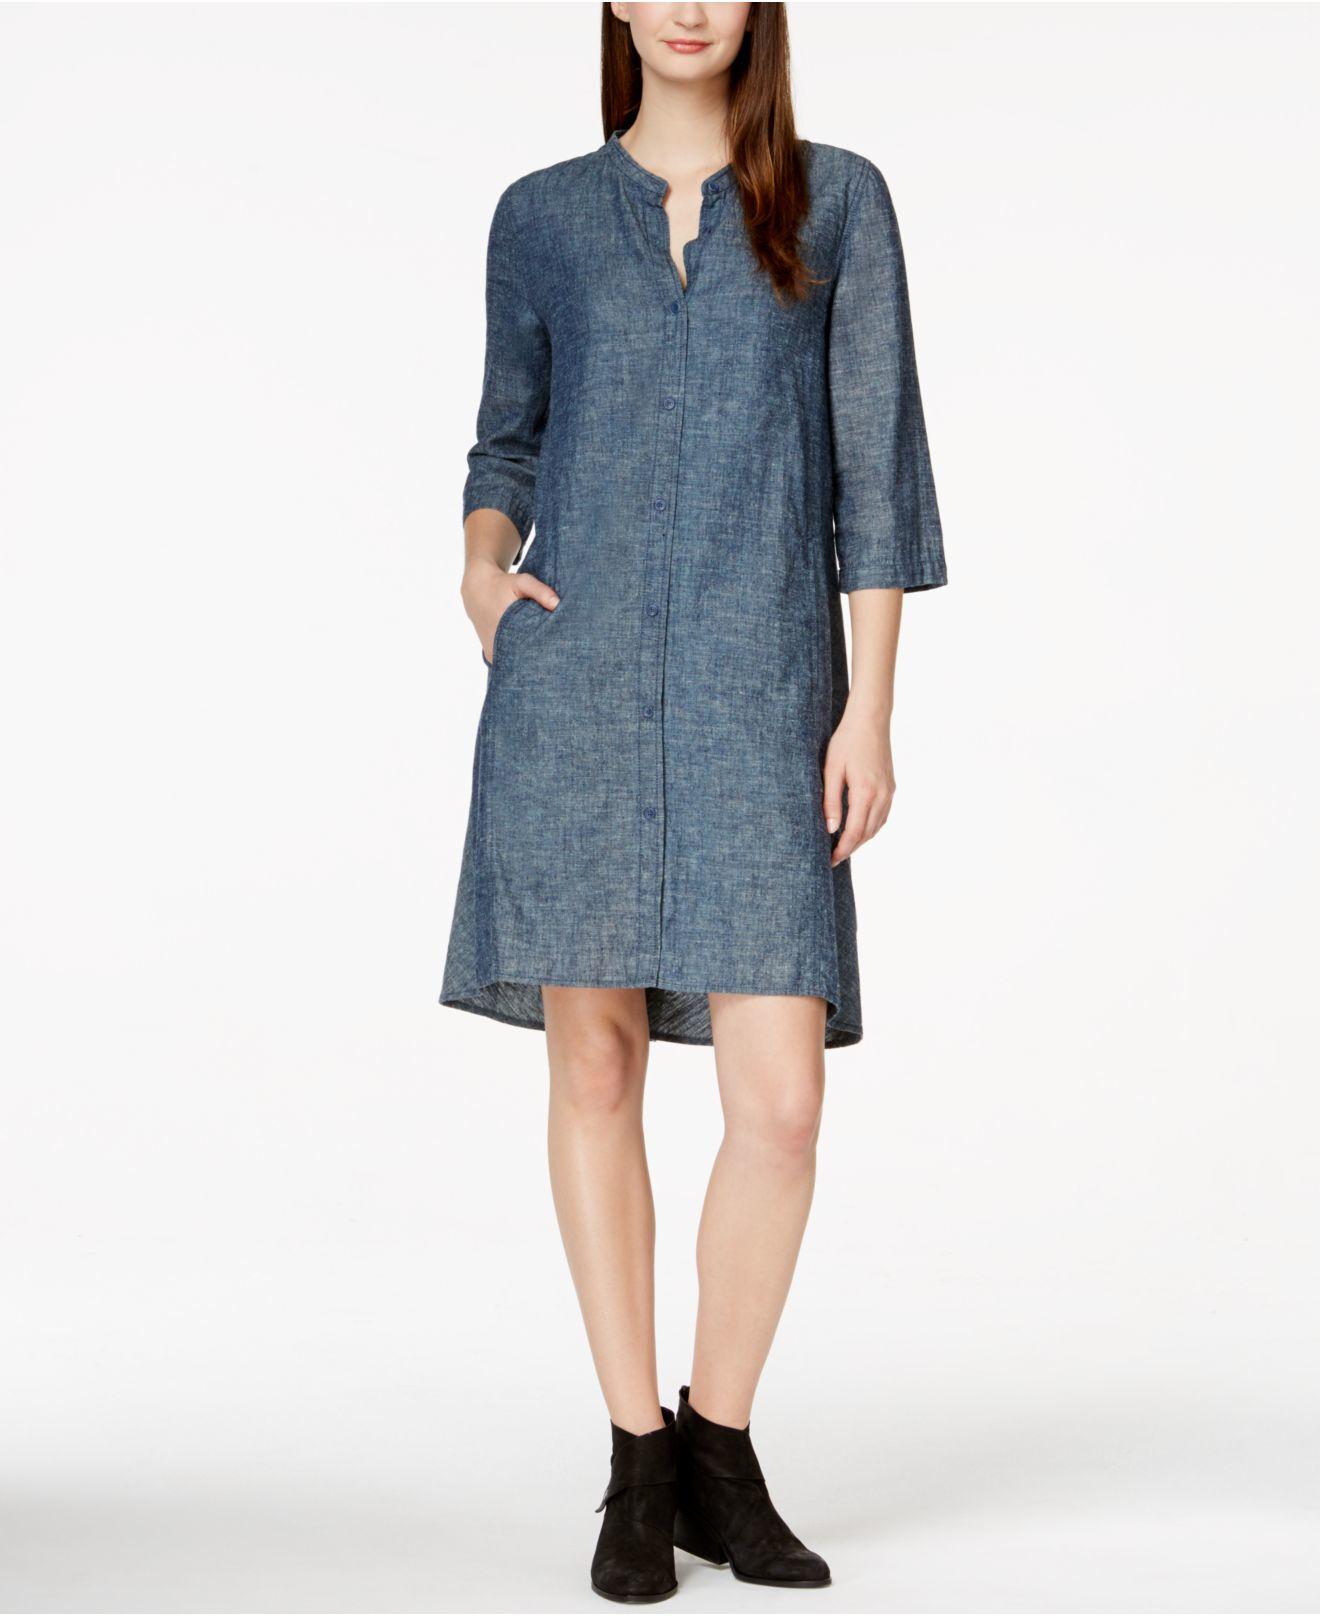 c3f1206cdef Lyst - Eileen Fisher Mandarin-collar Denim Shirtdress in Blue